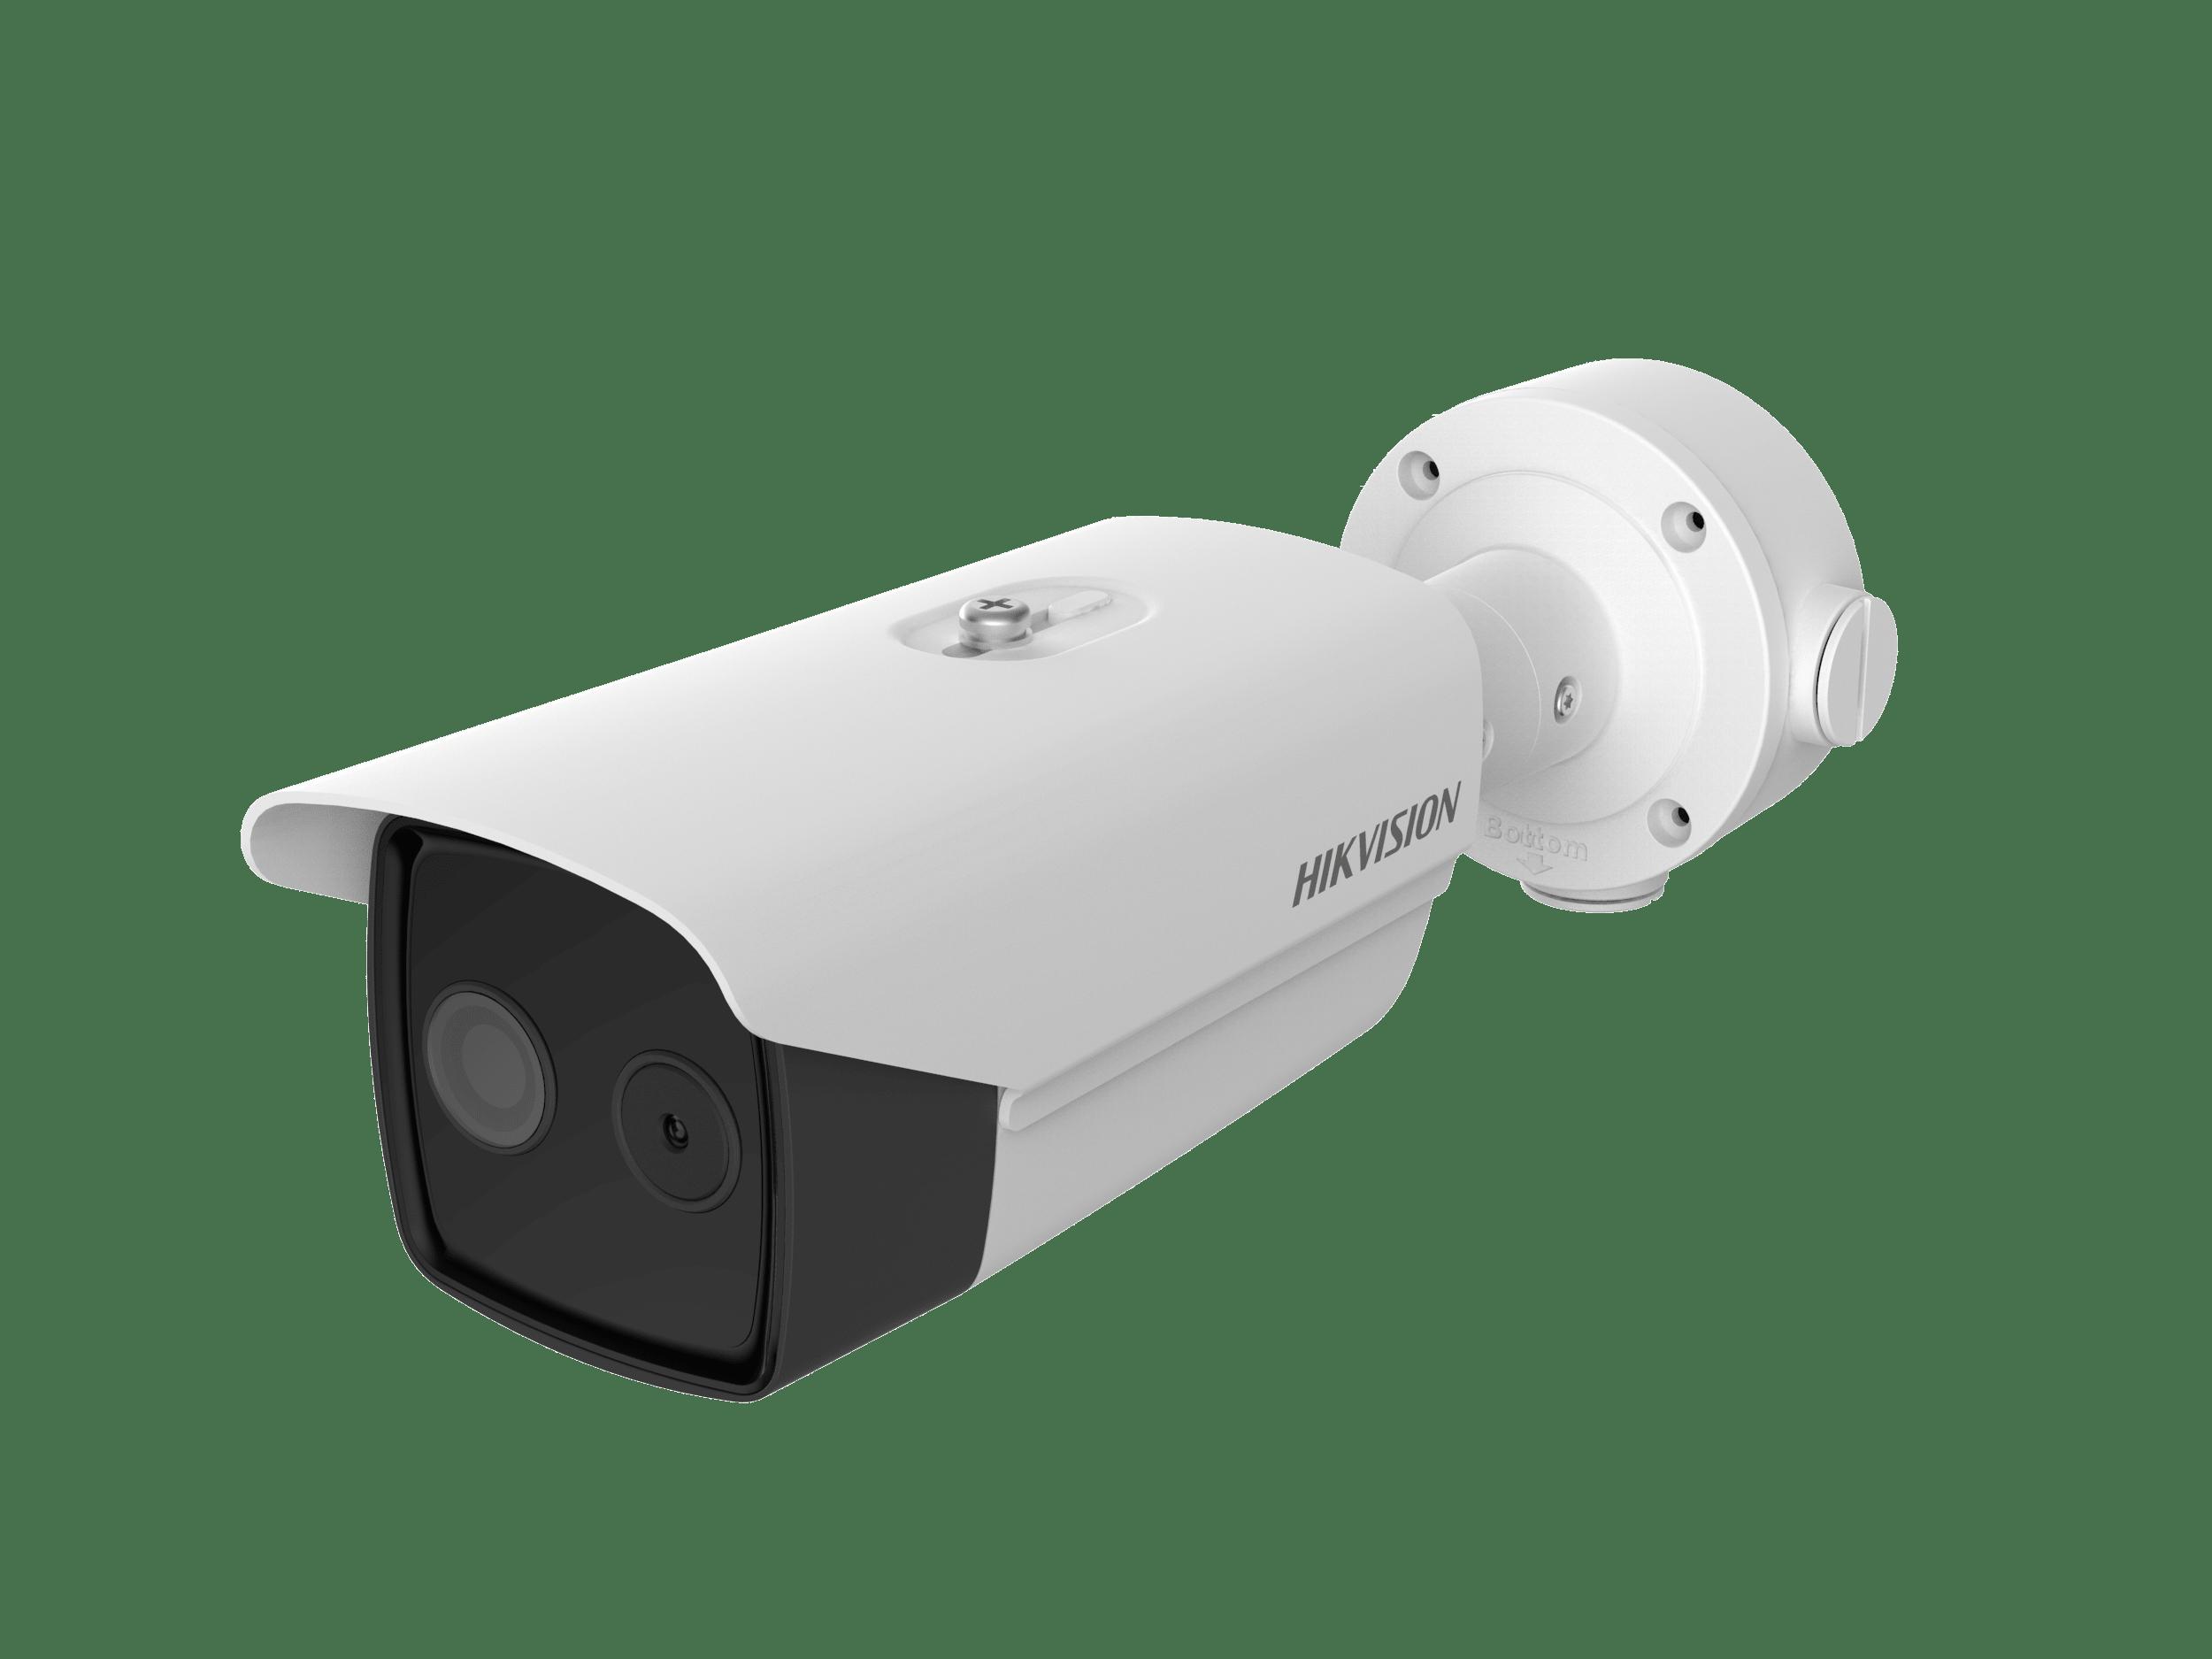 Thermal Bullet CCTV camera